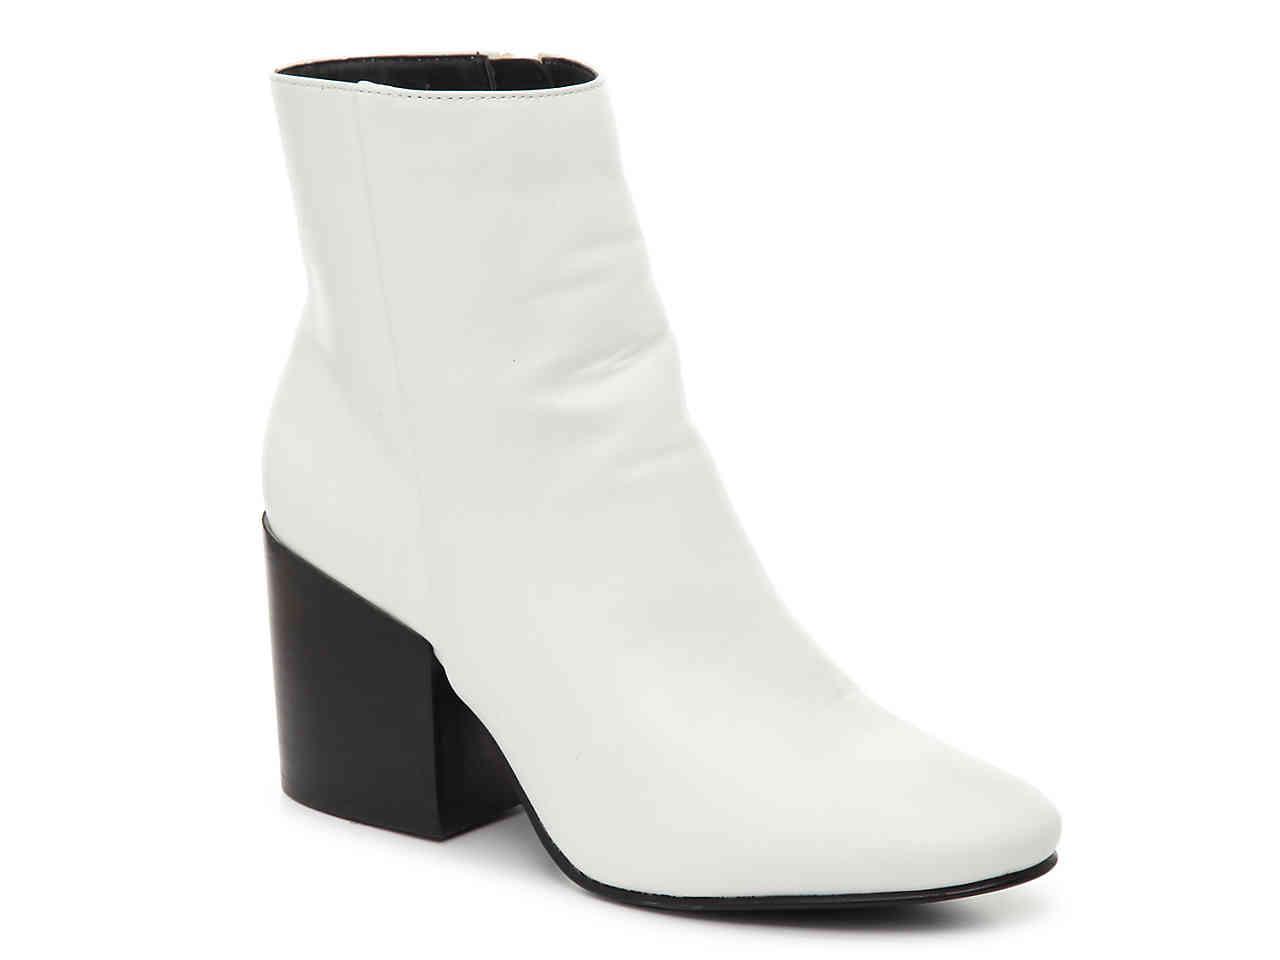 437e09026db0 Lyst - Madden Girl Aaden Bootie in White